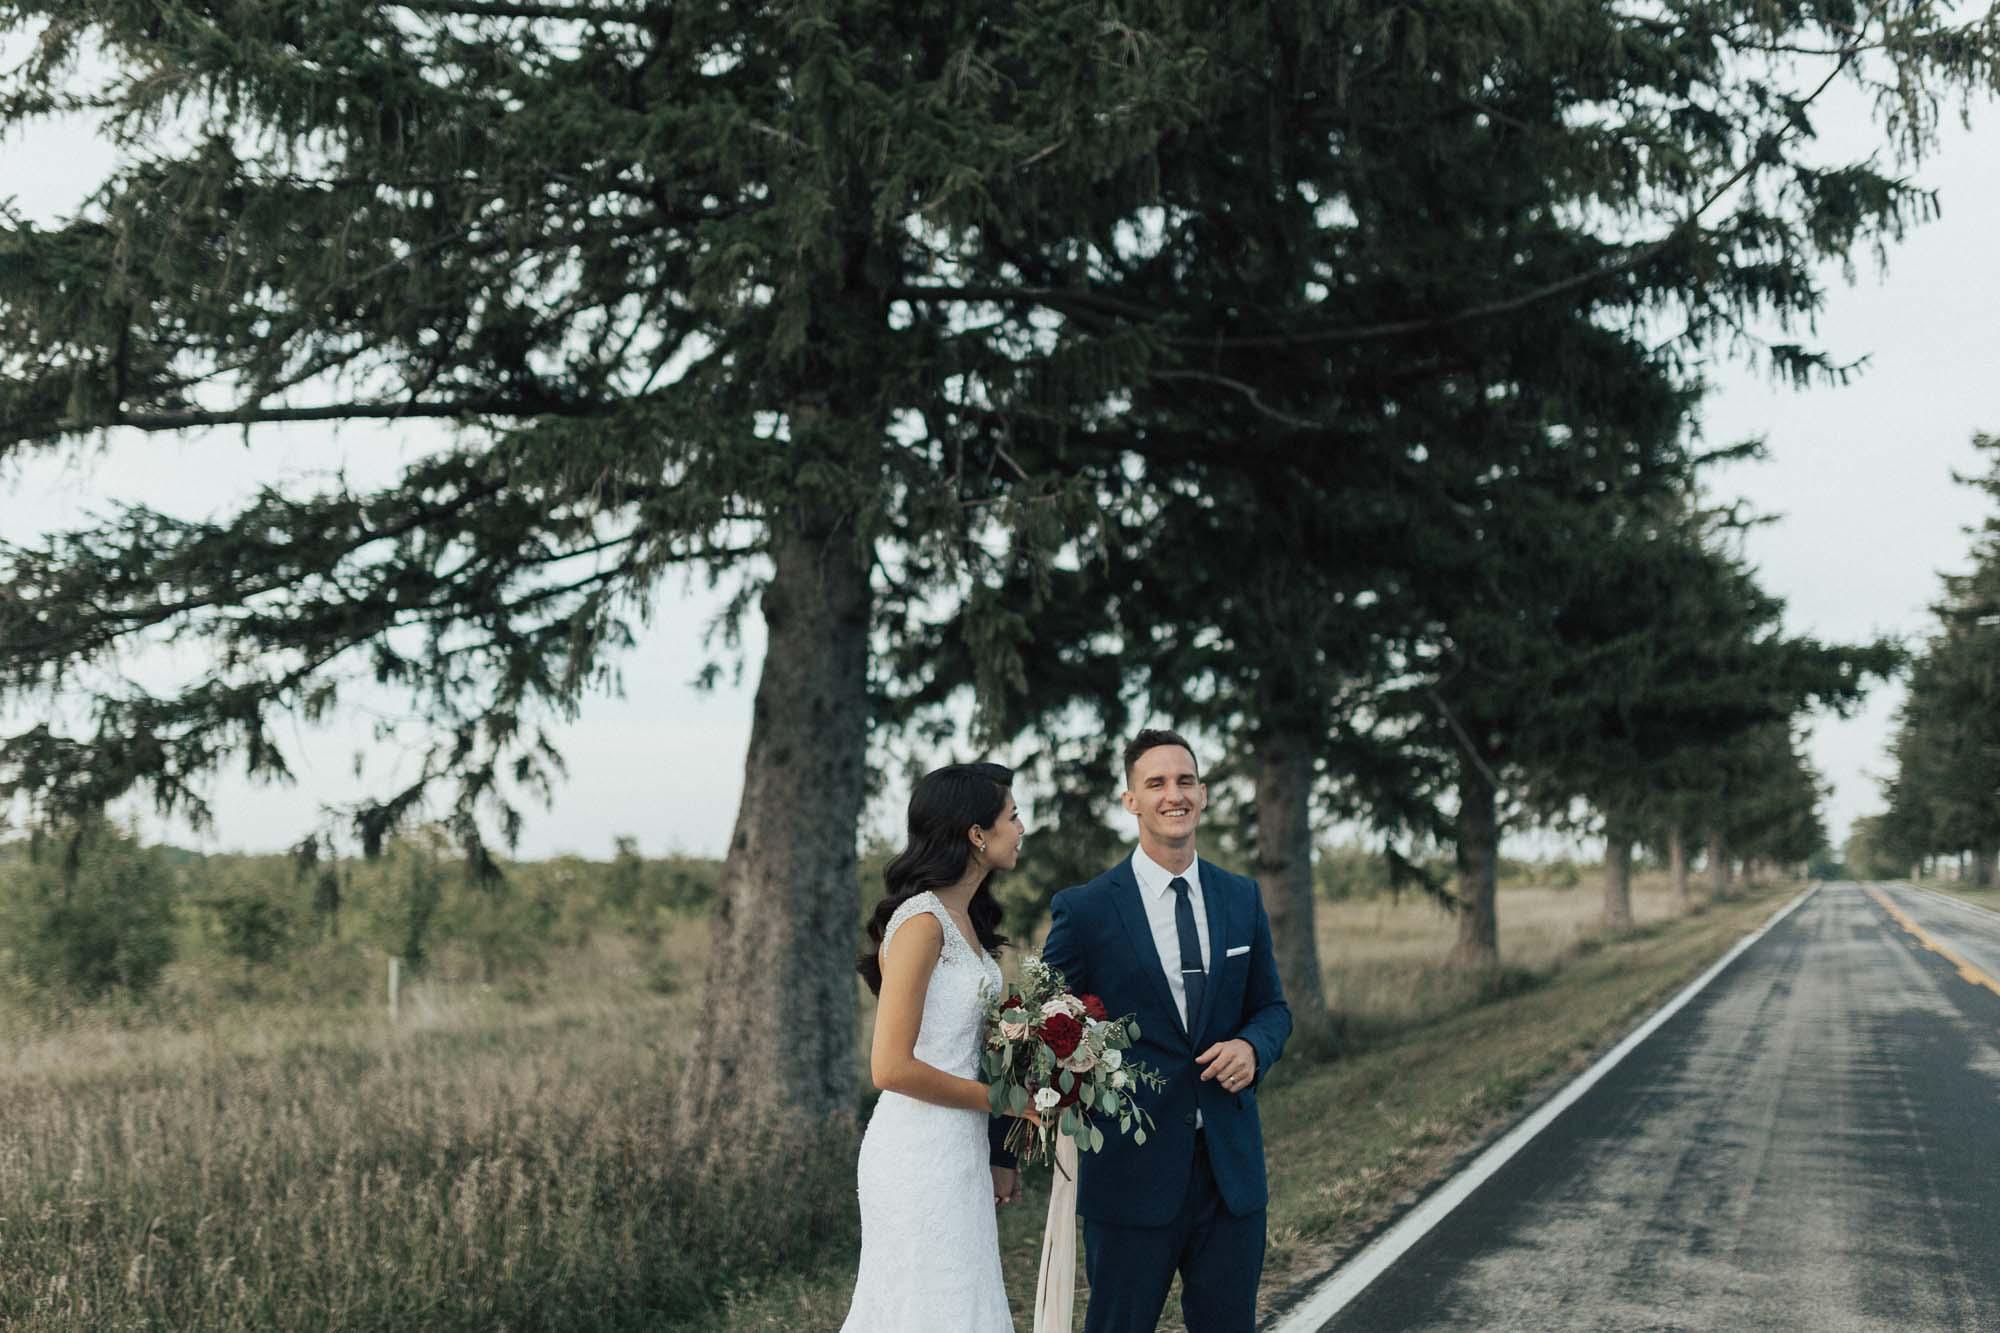 champaign_il_wedding_photography-0780.jpg